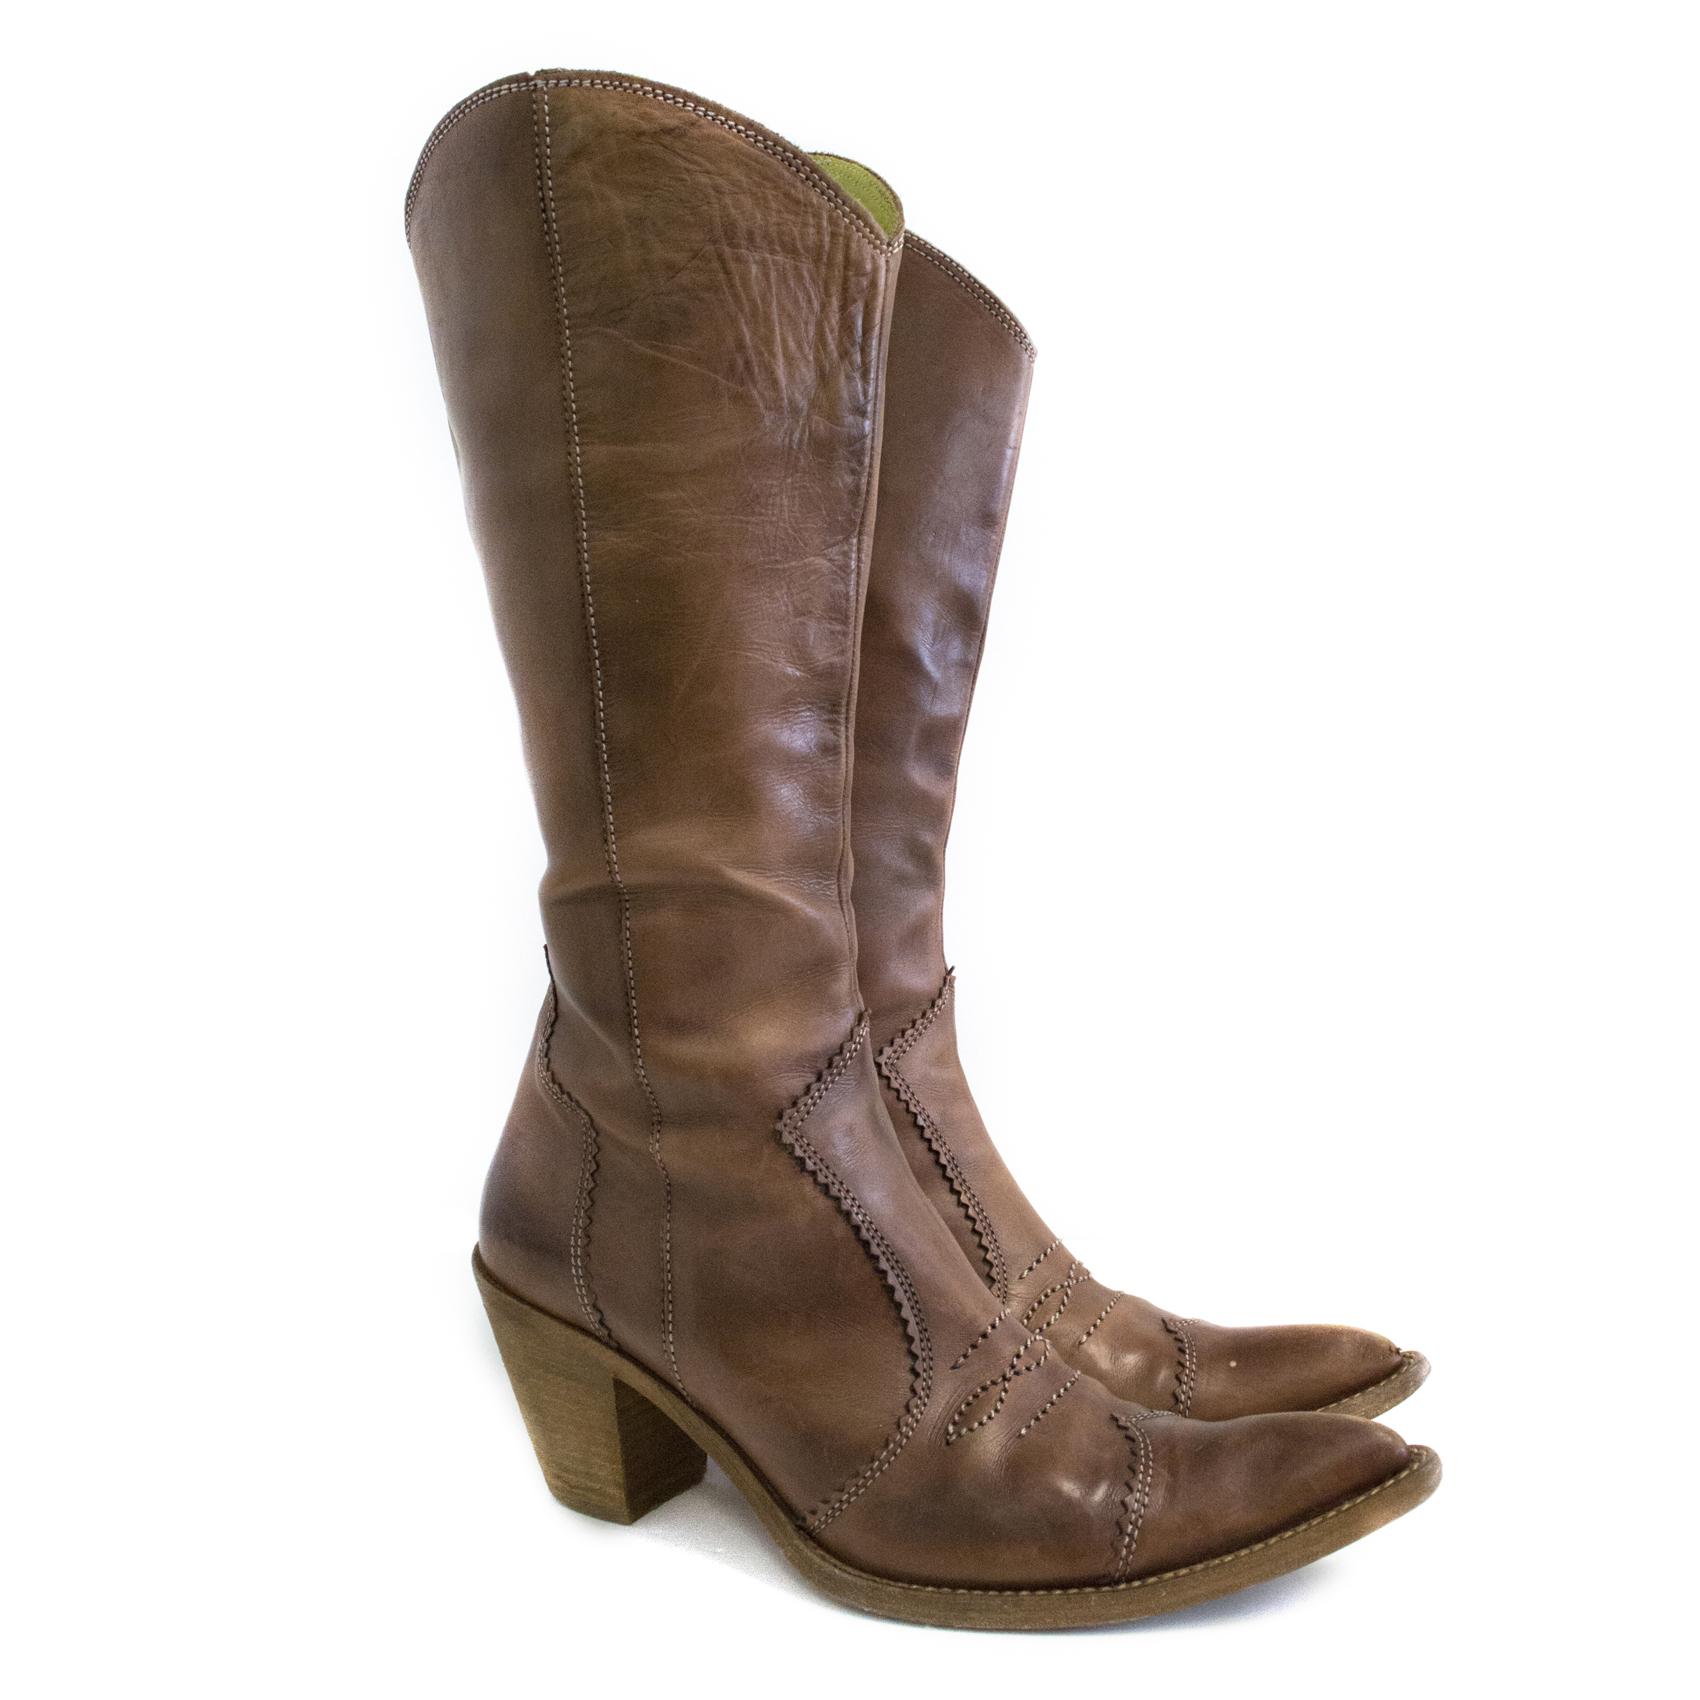 Mirage cowboy brown boots